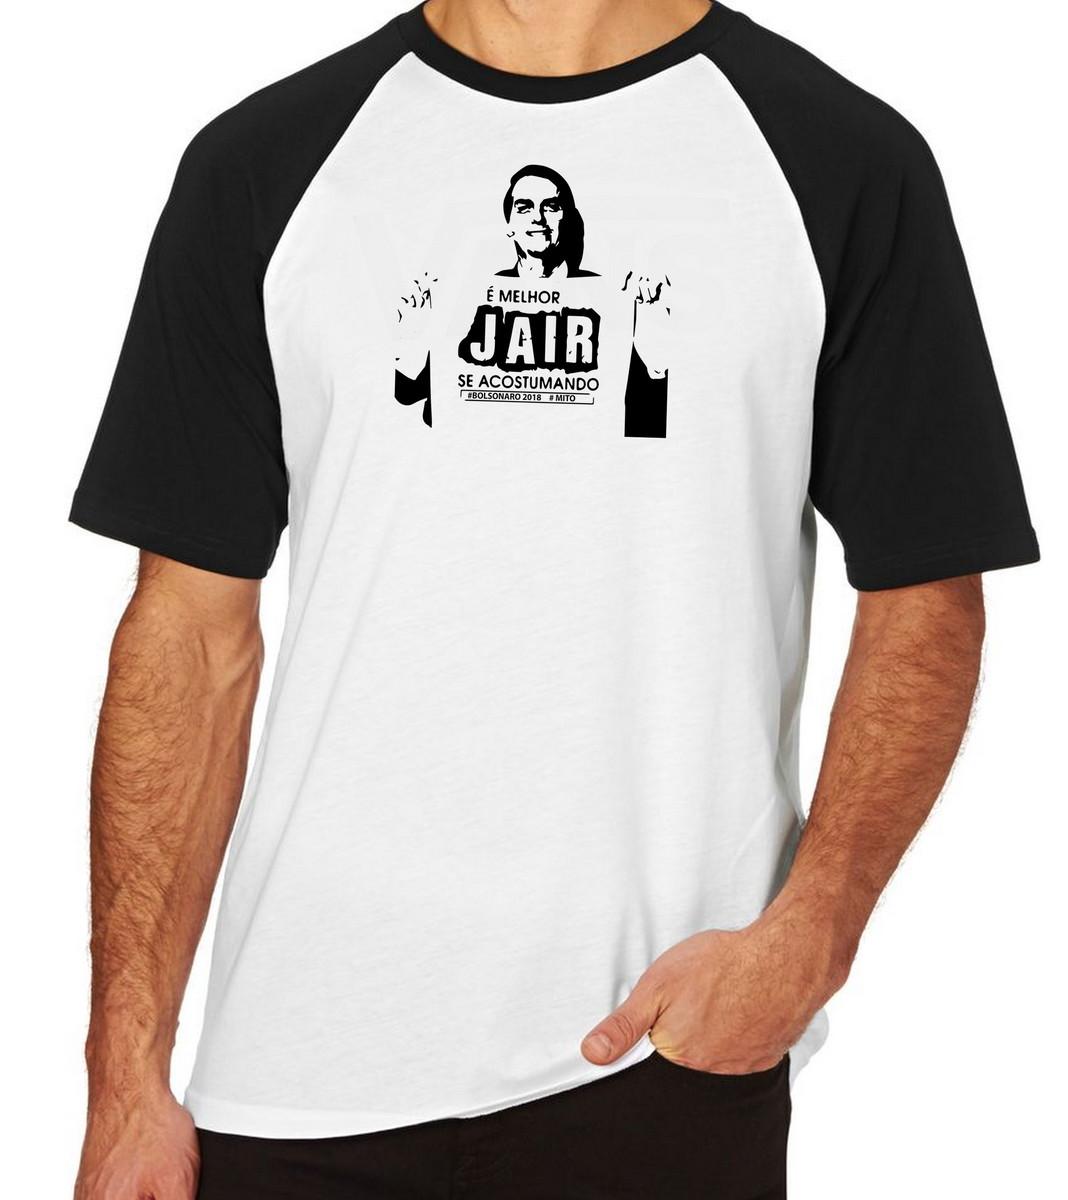 7ad0824f3b Camiseta Raglan Camisa Blusa Bolsonaro Jair se acostumando no Elo7 ...